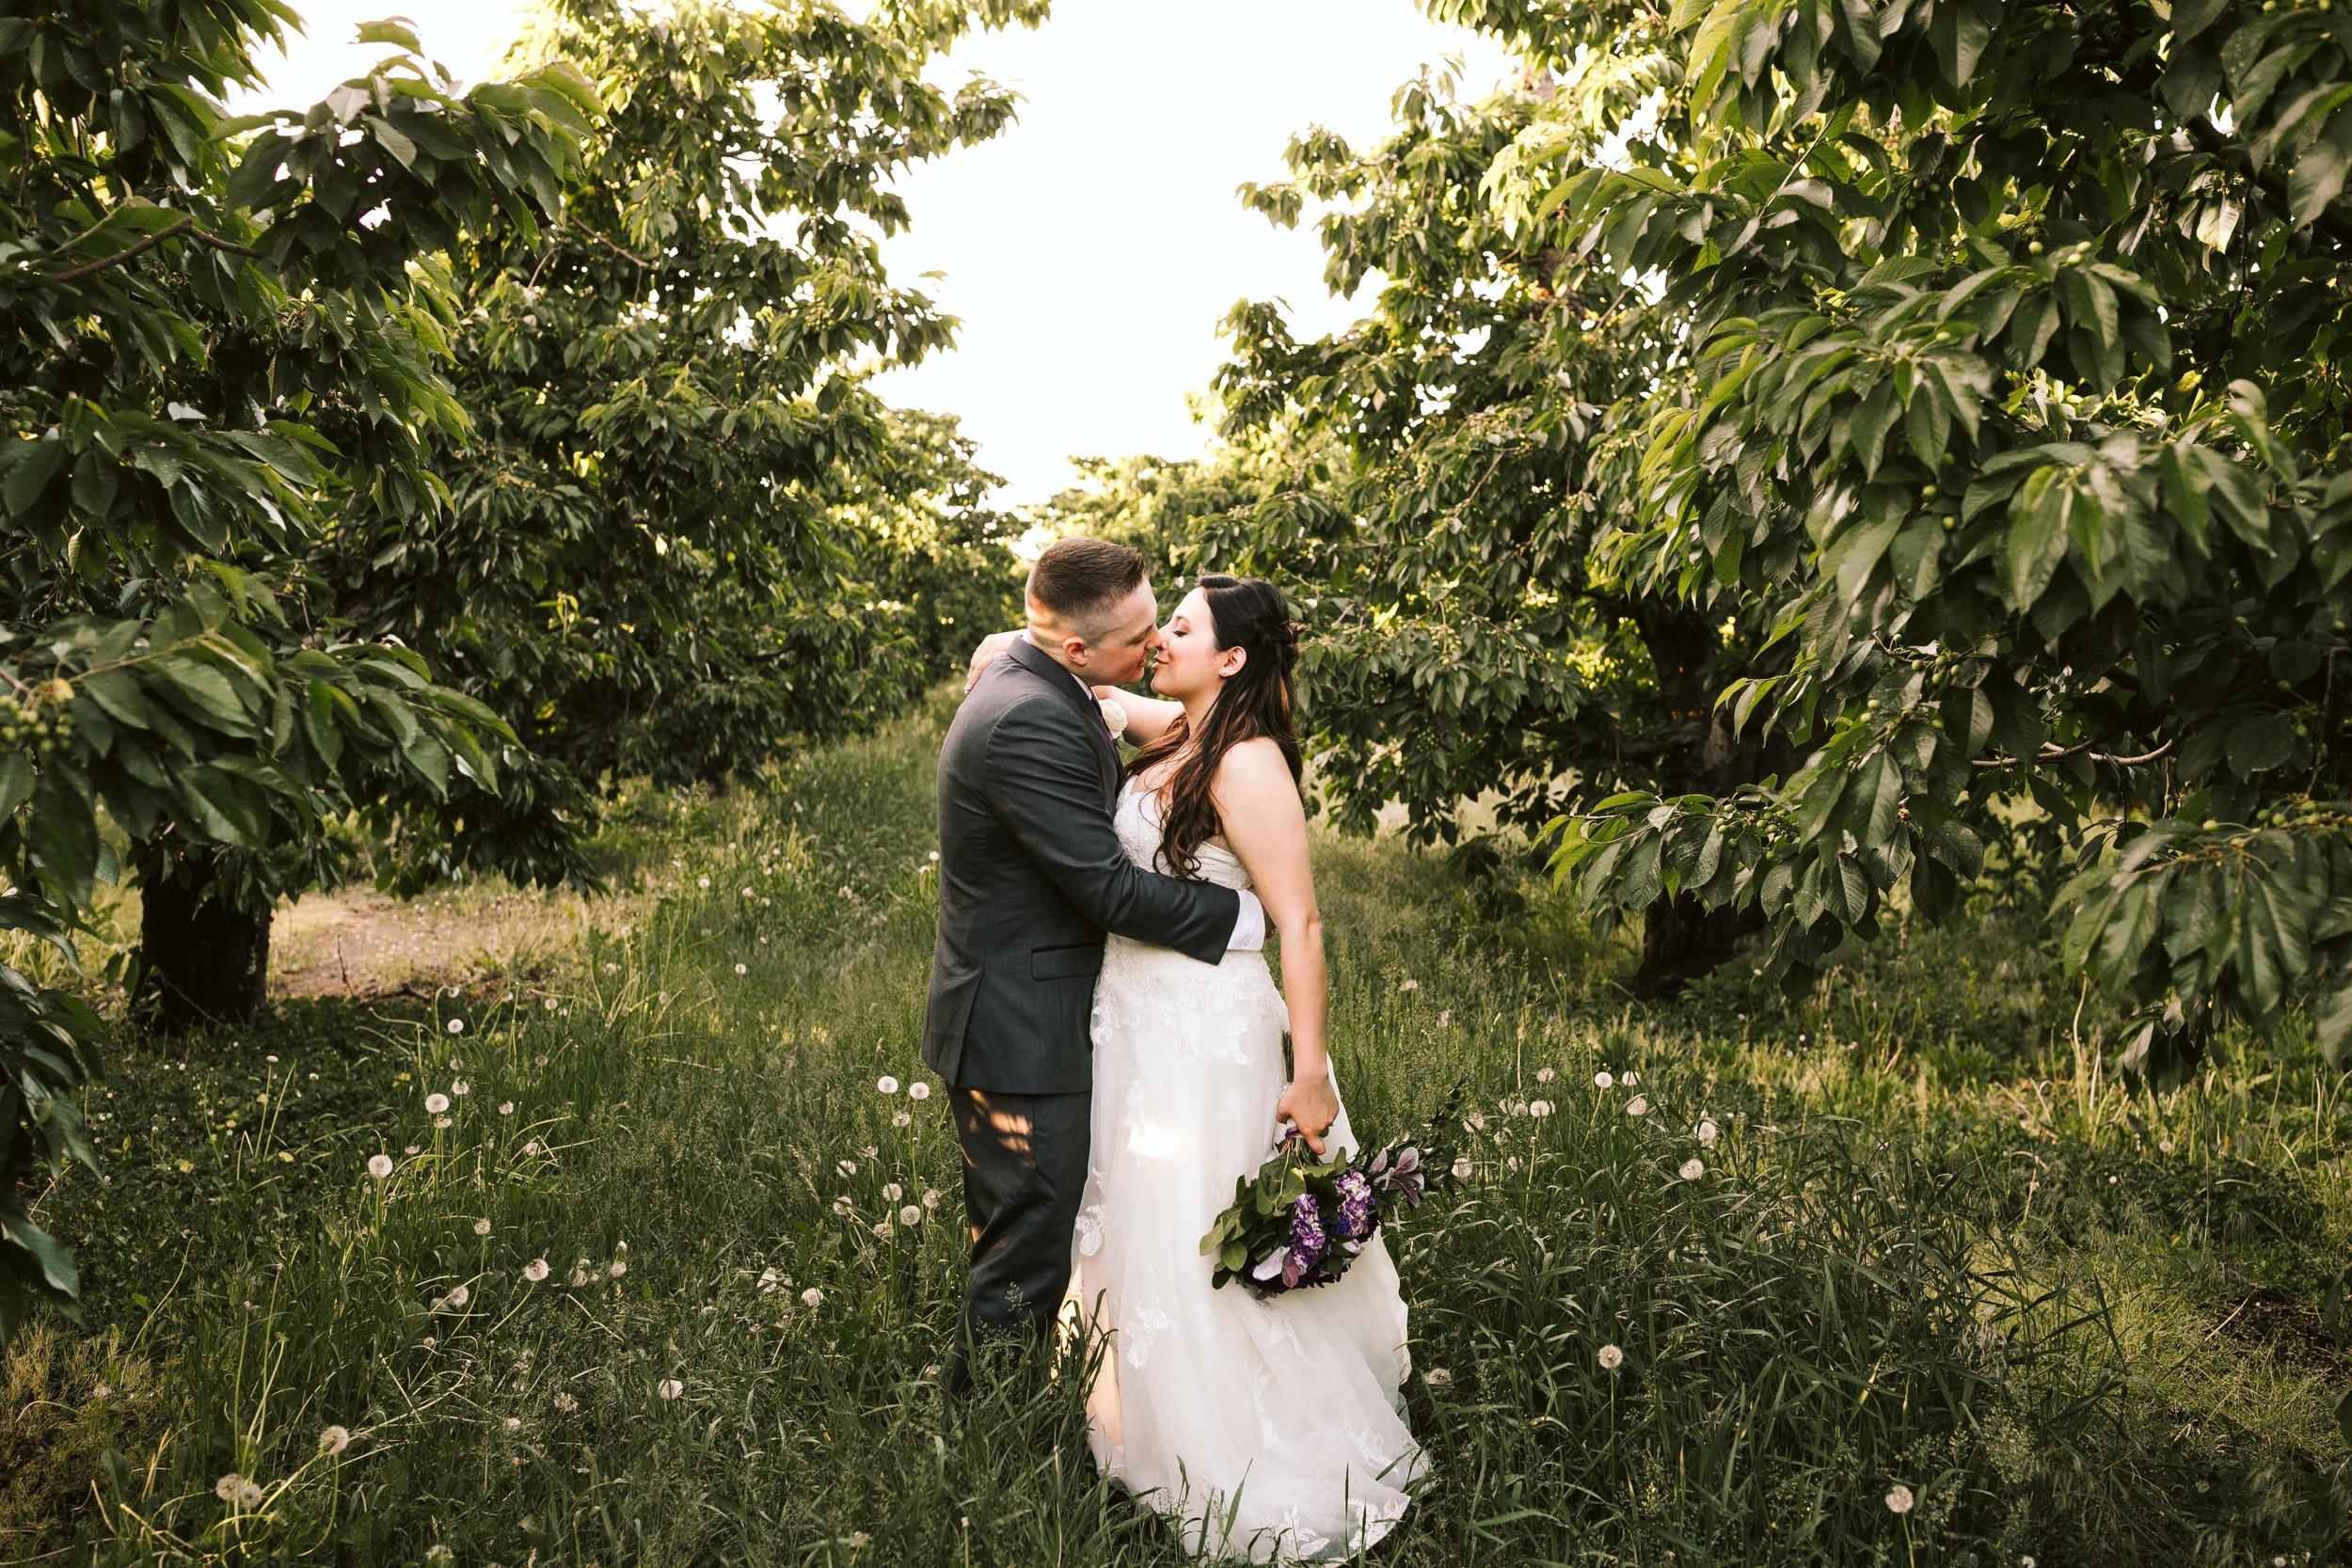 tuncannon-cellars-wedding-116.jpg